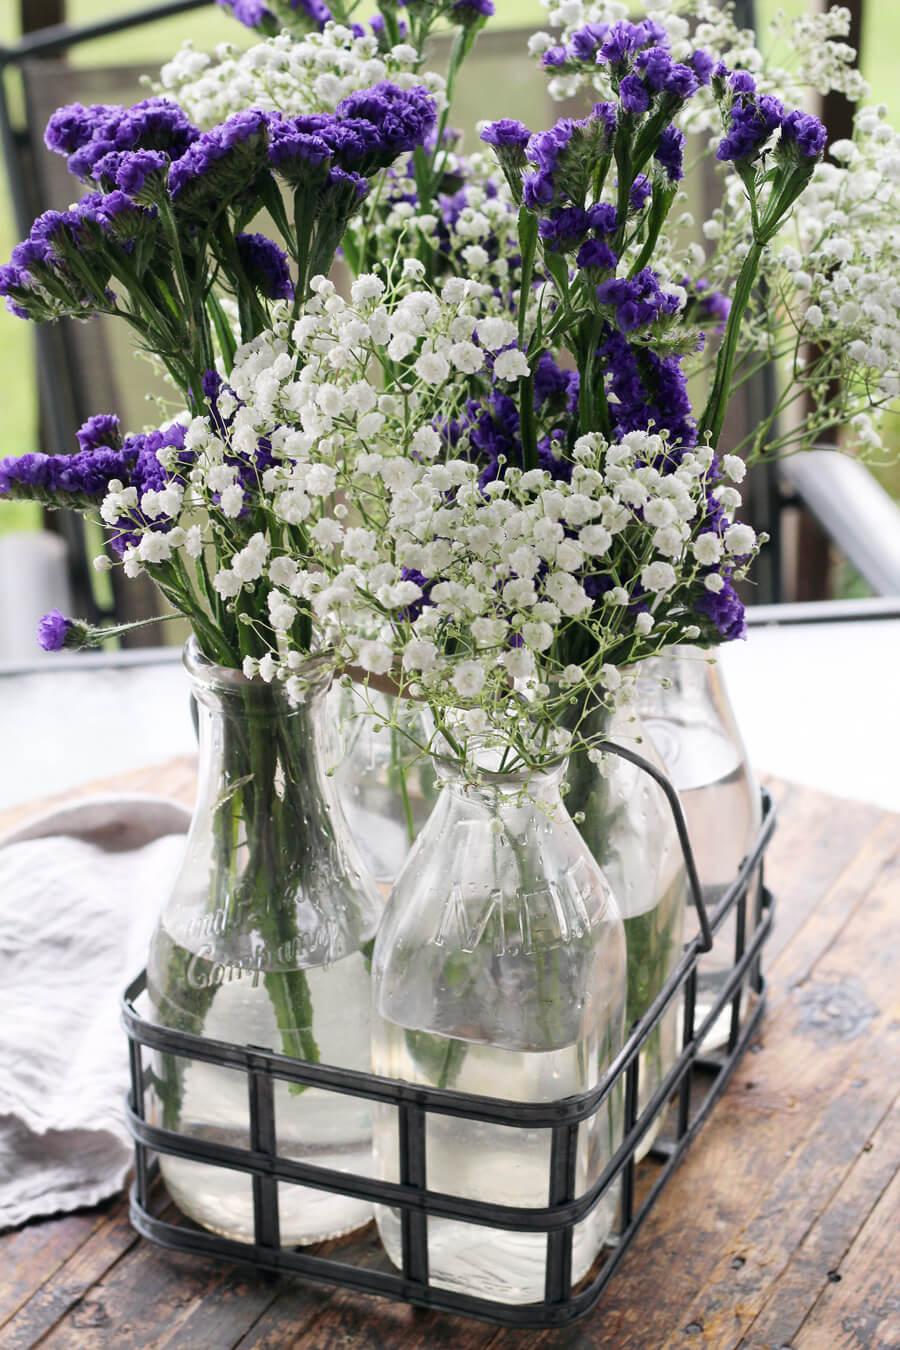 A flower arrangement of baby's breath and purple flowers in vintage milk bottles